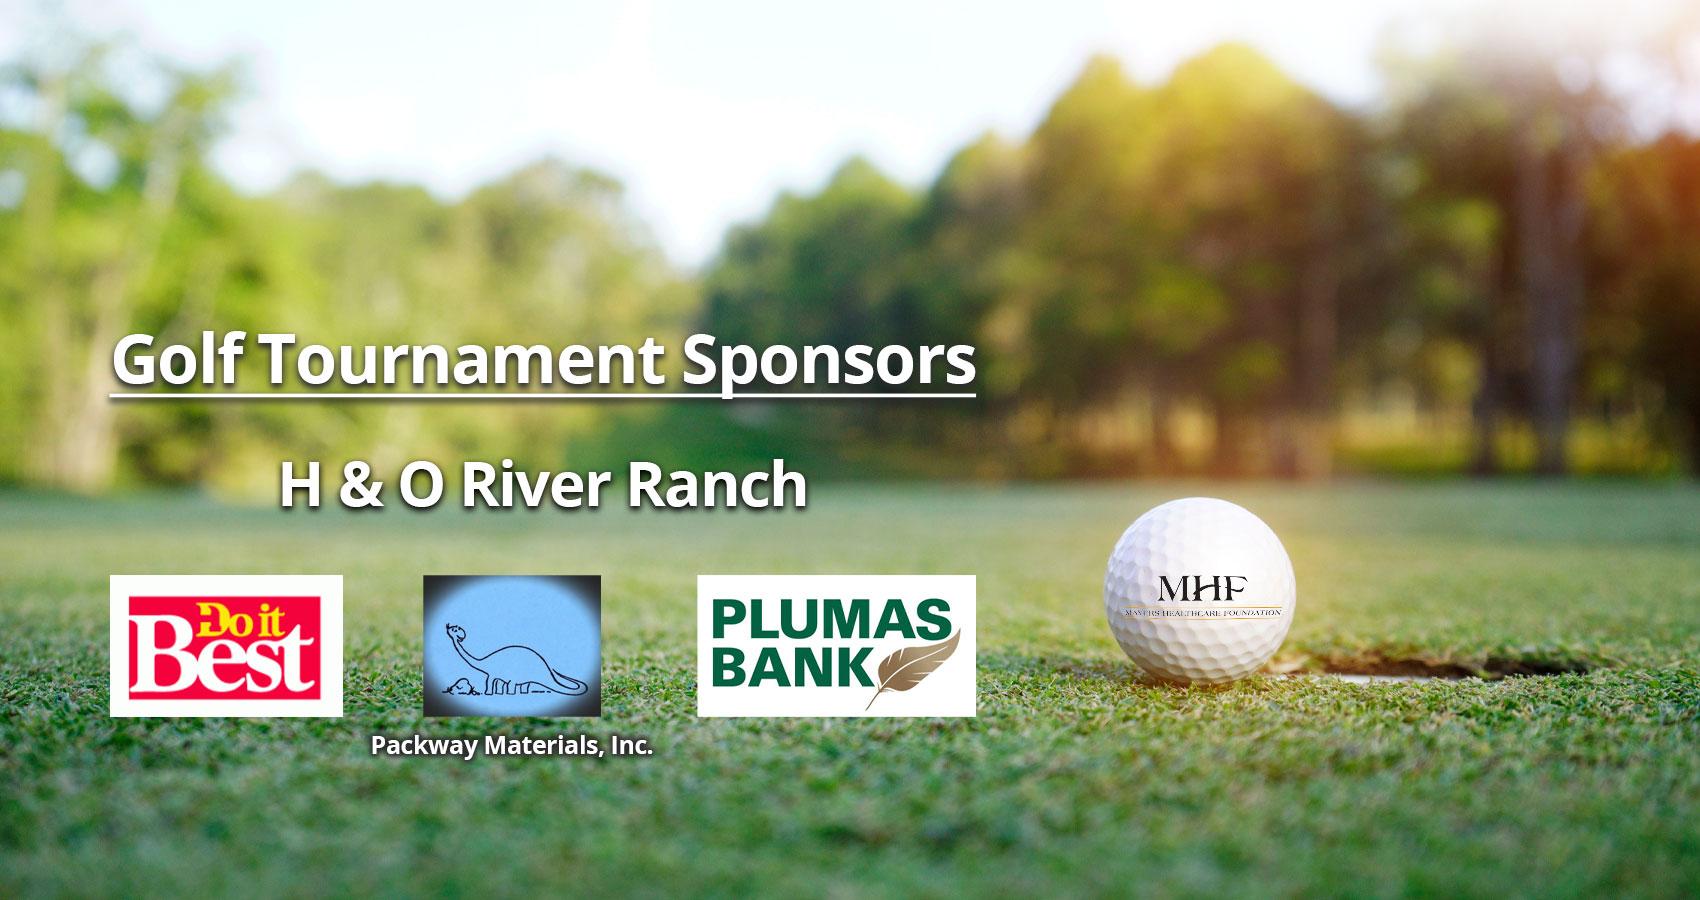 Golf Tournament sponsors  Do It Best Valley Hardware & Nursery logo Plumas Bank logo H & O River Ranch